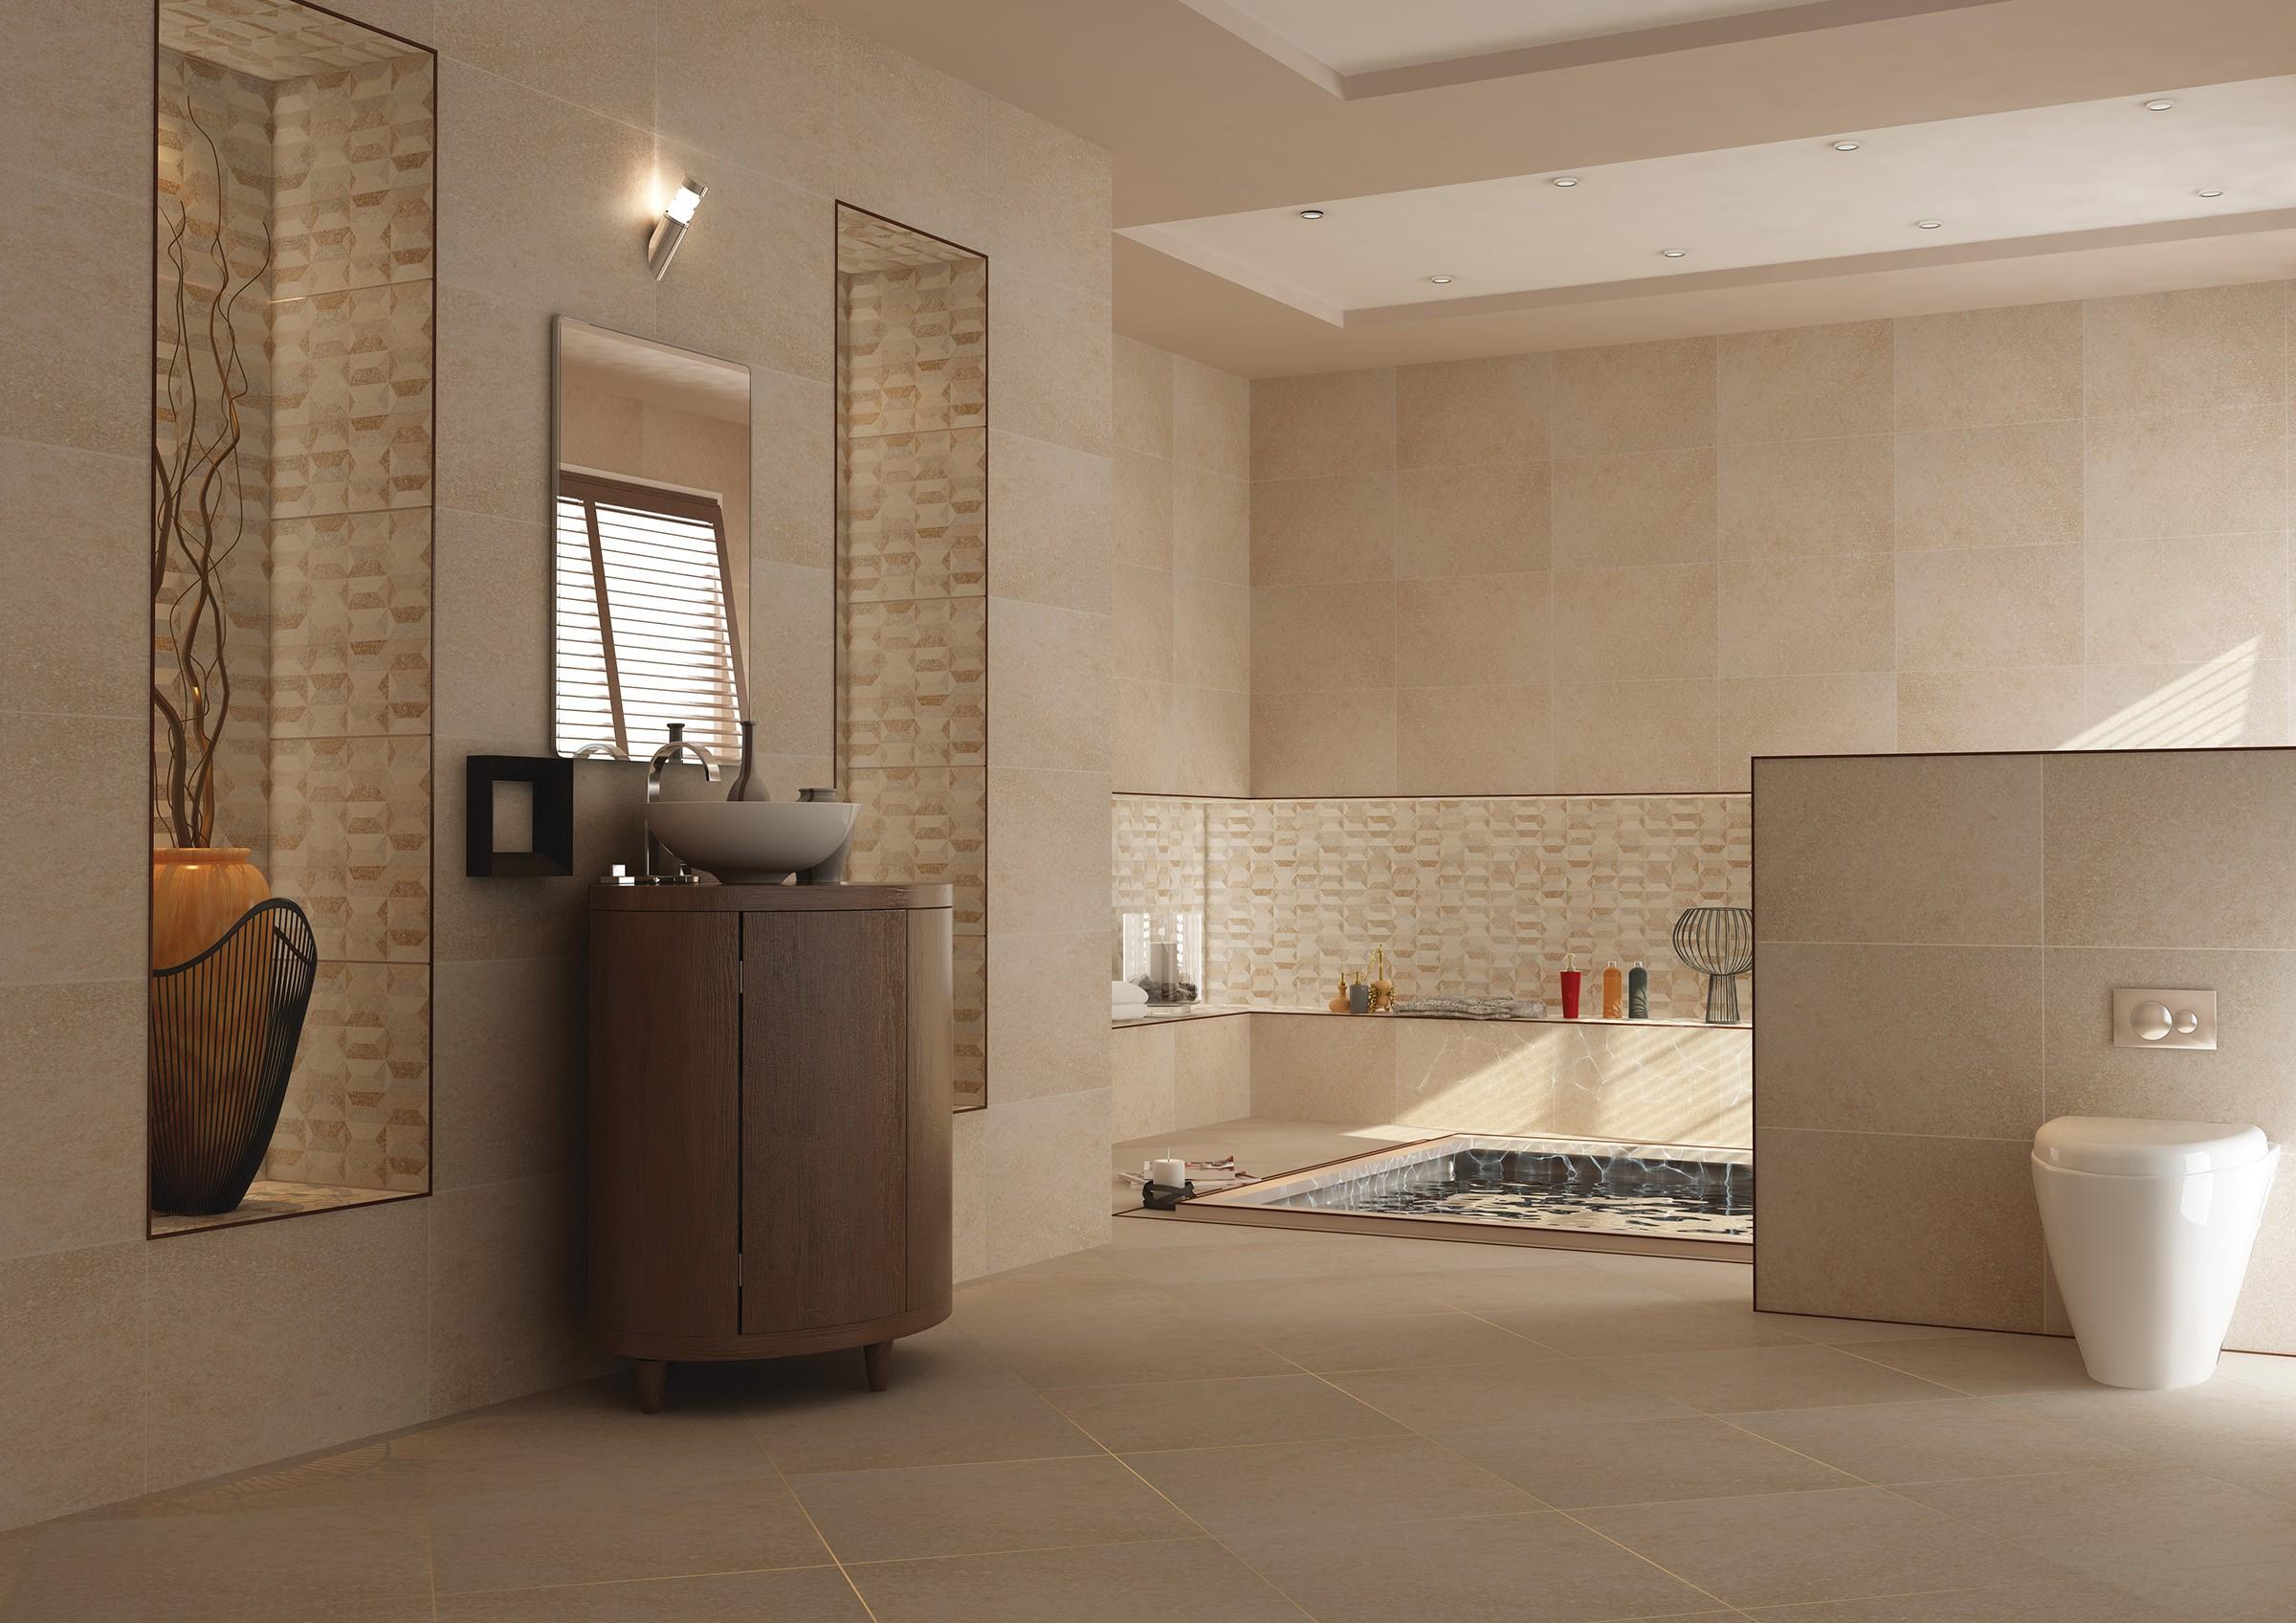 Floor and wall bathroom tiles rak bevelrock dailygadgetfo Image collections